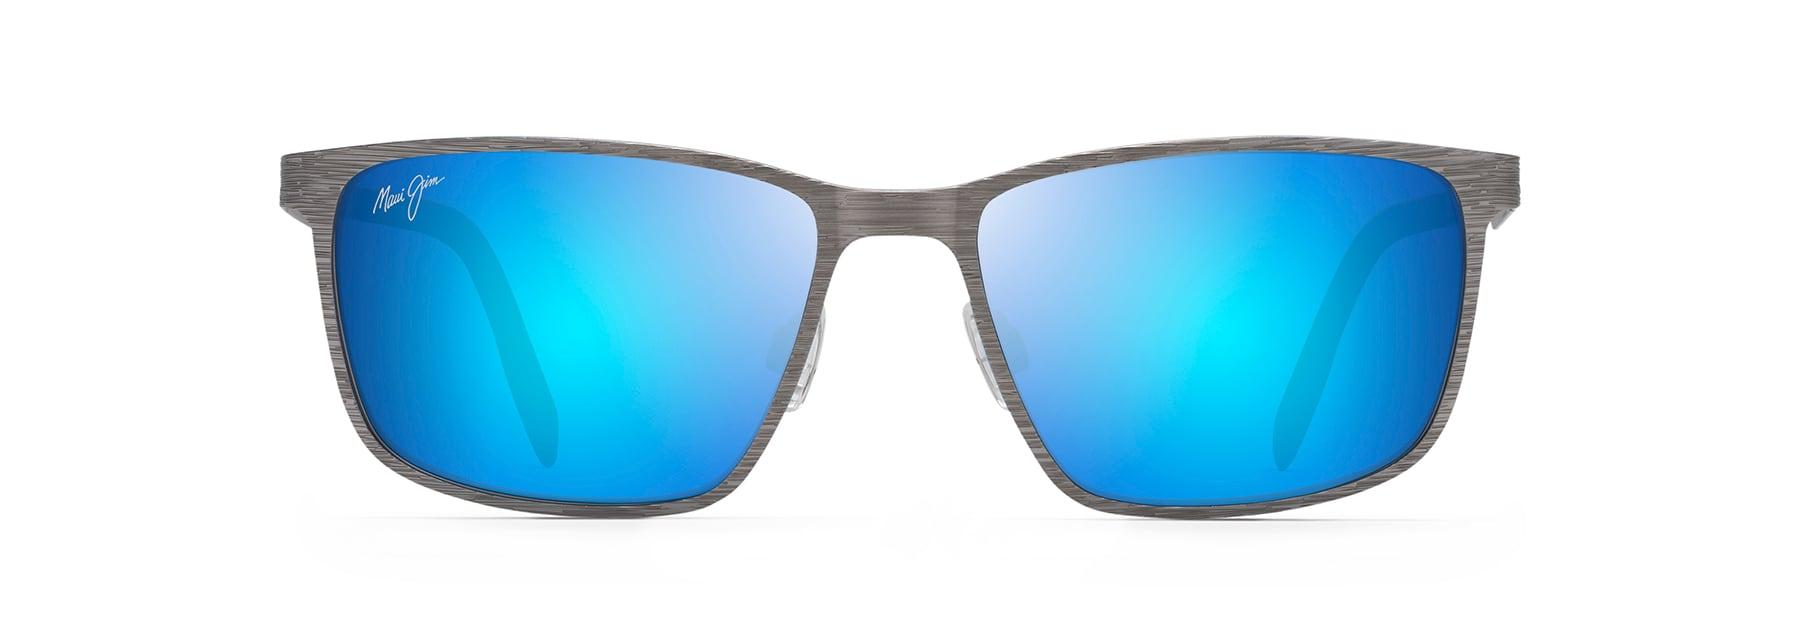 a67930d80f91 Cut Mountain Polarized Sunglasses